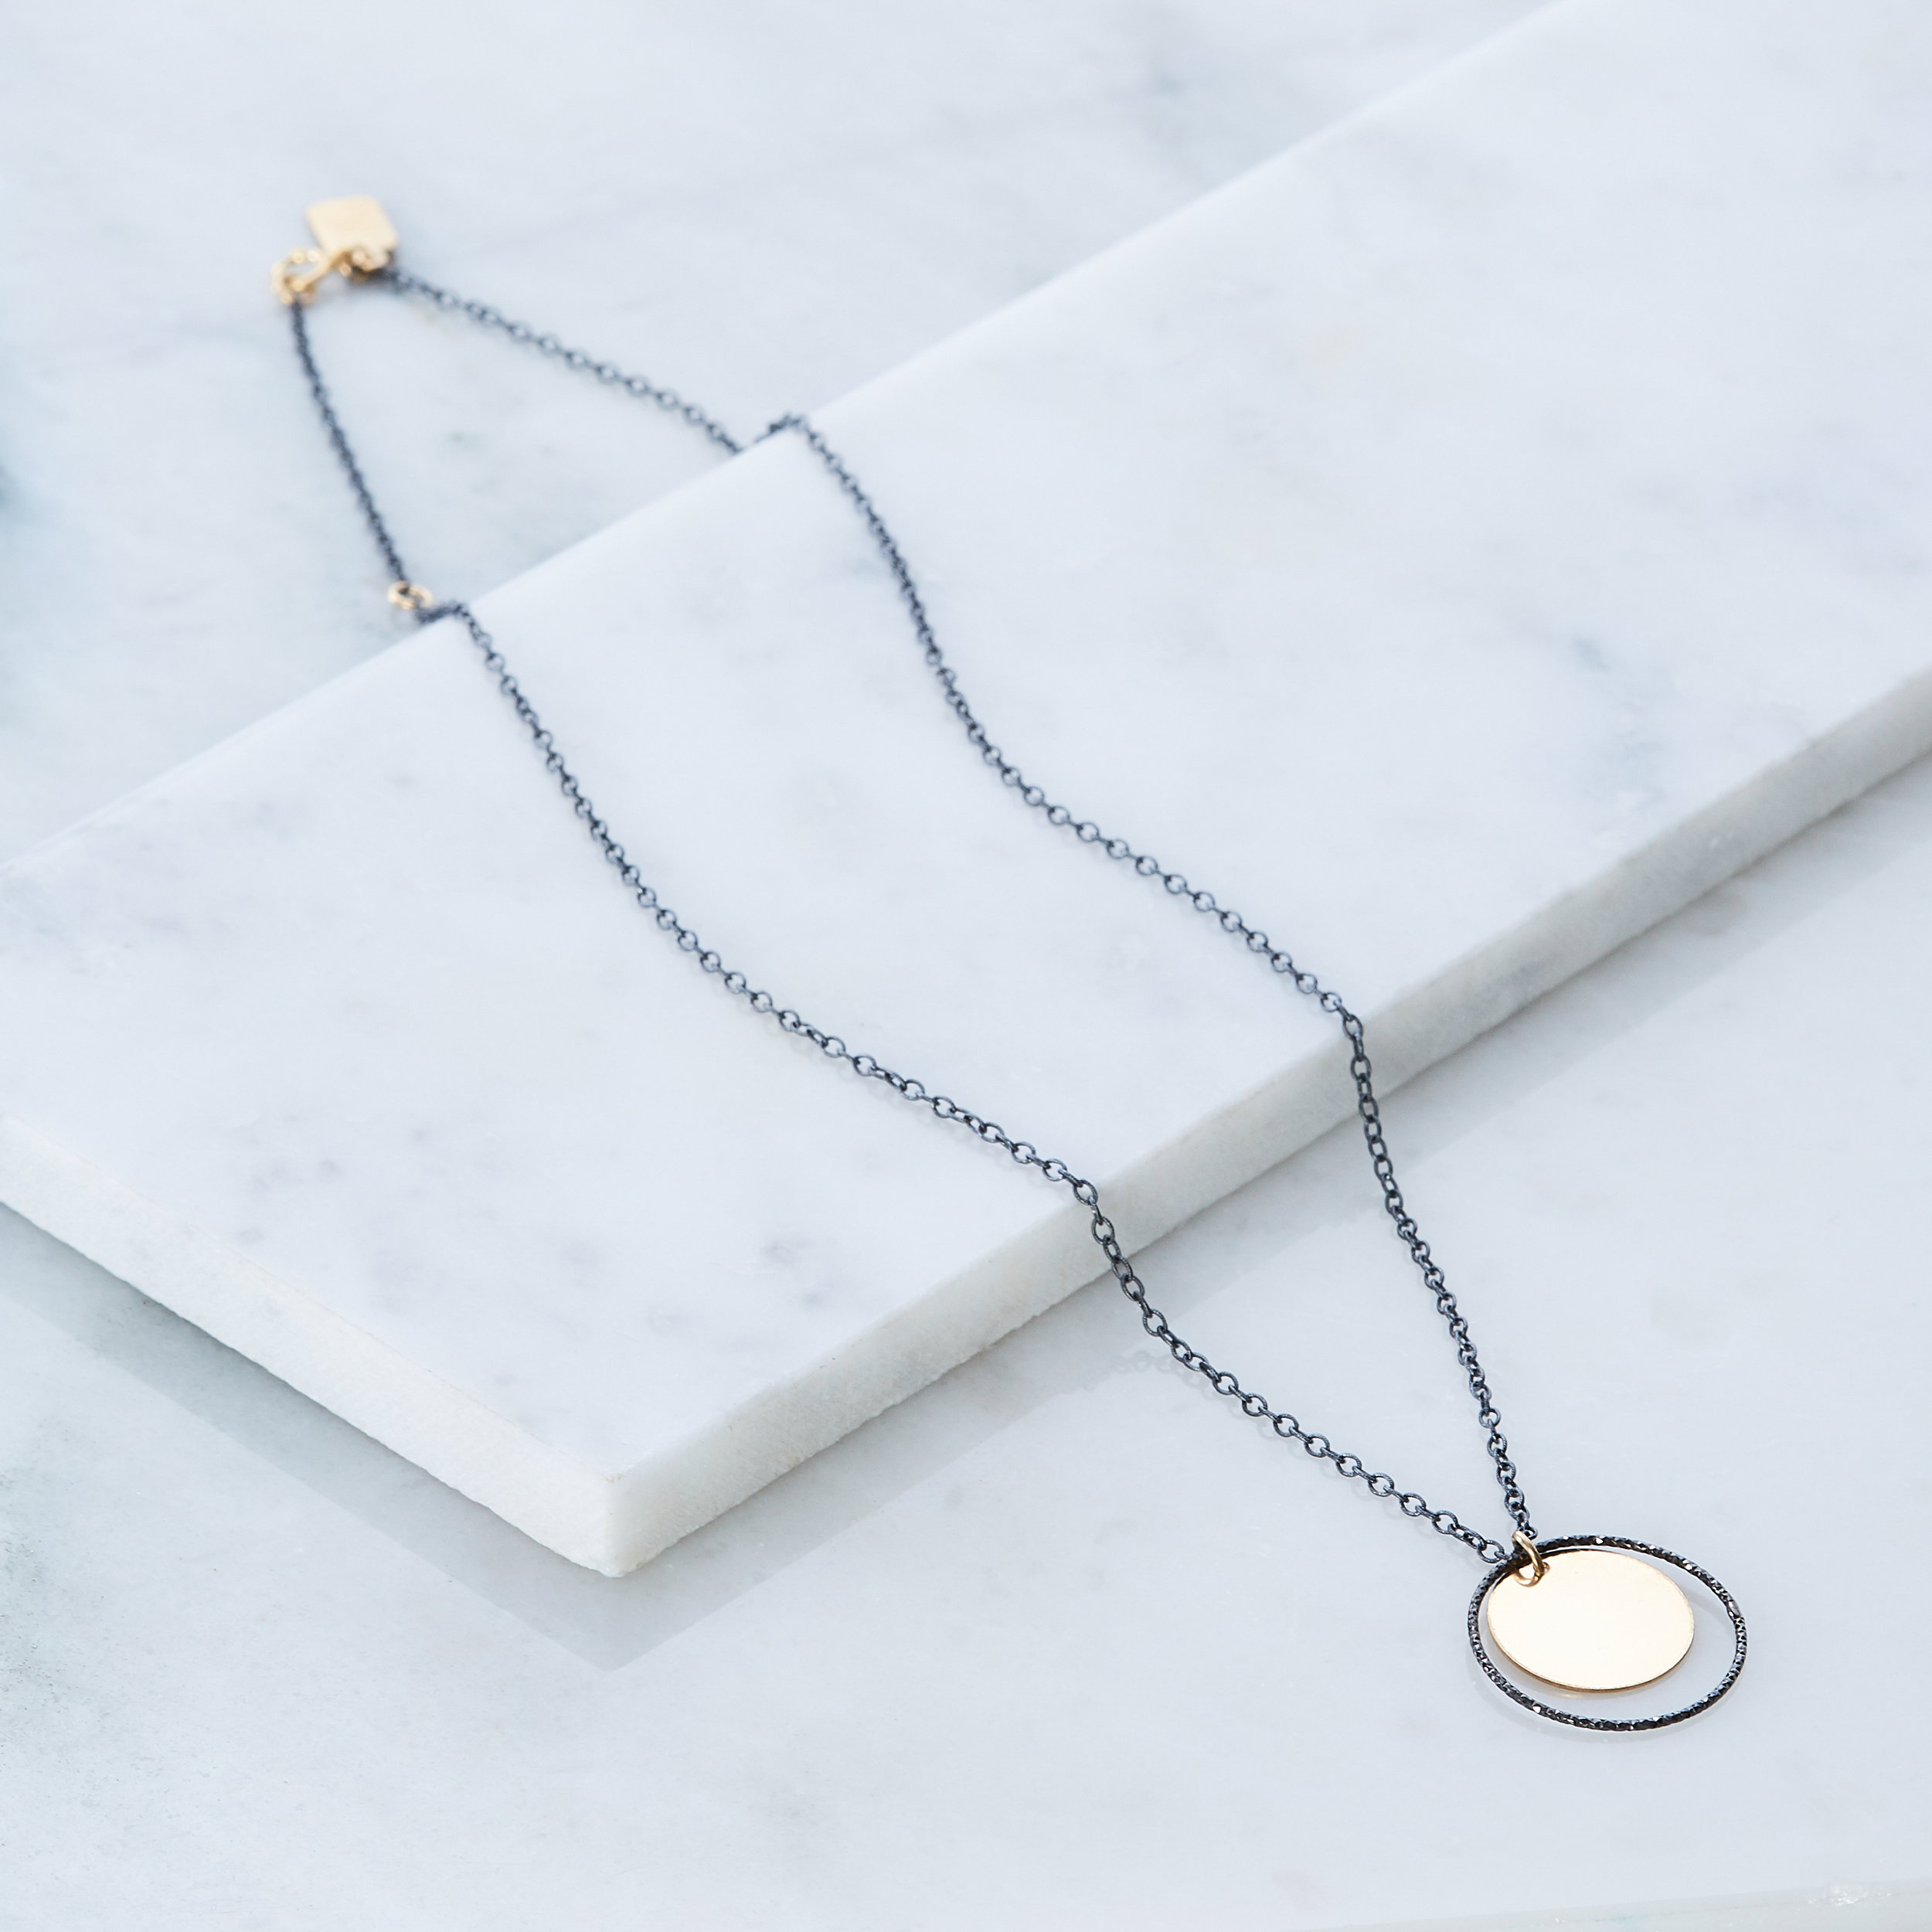 Midnight Eclipse Necklace